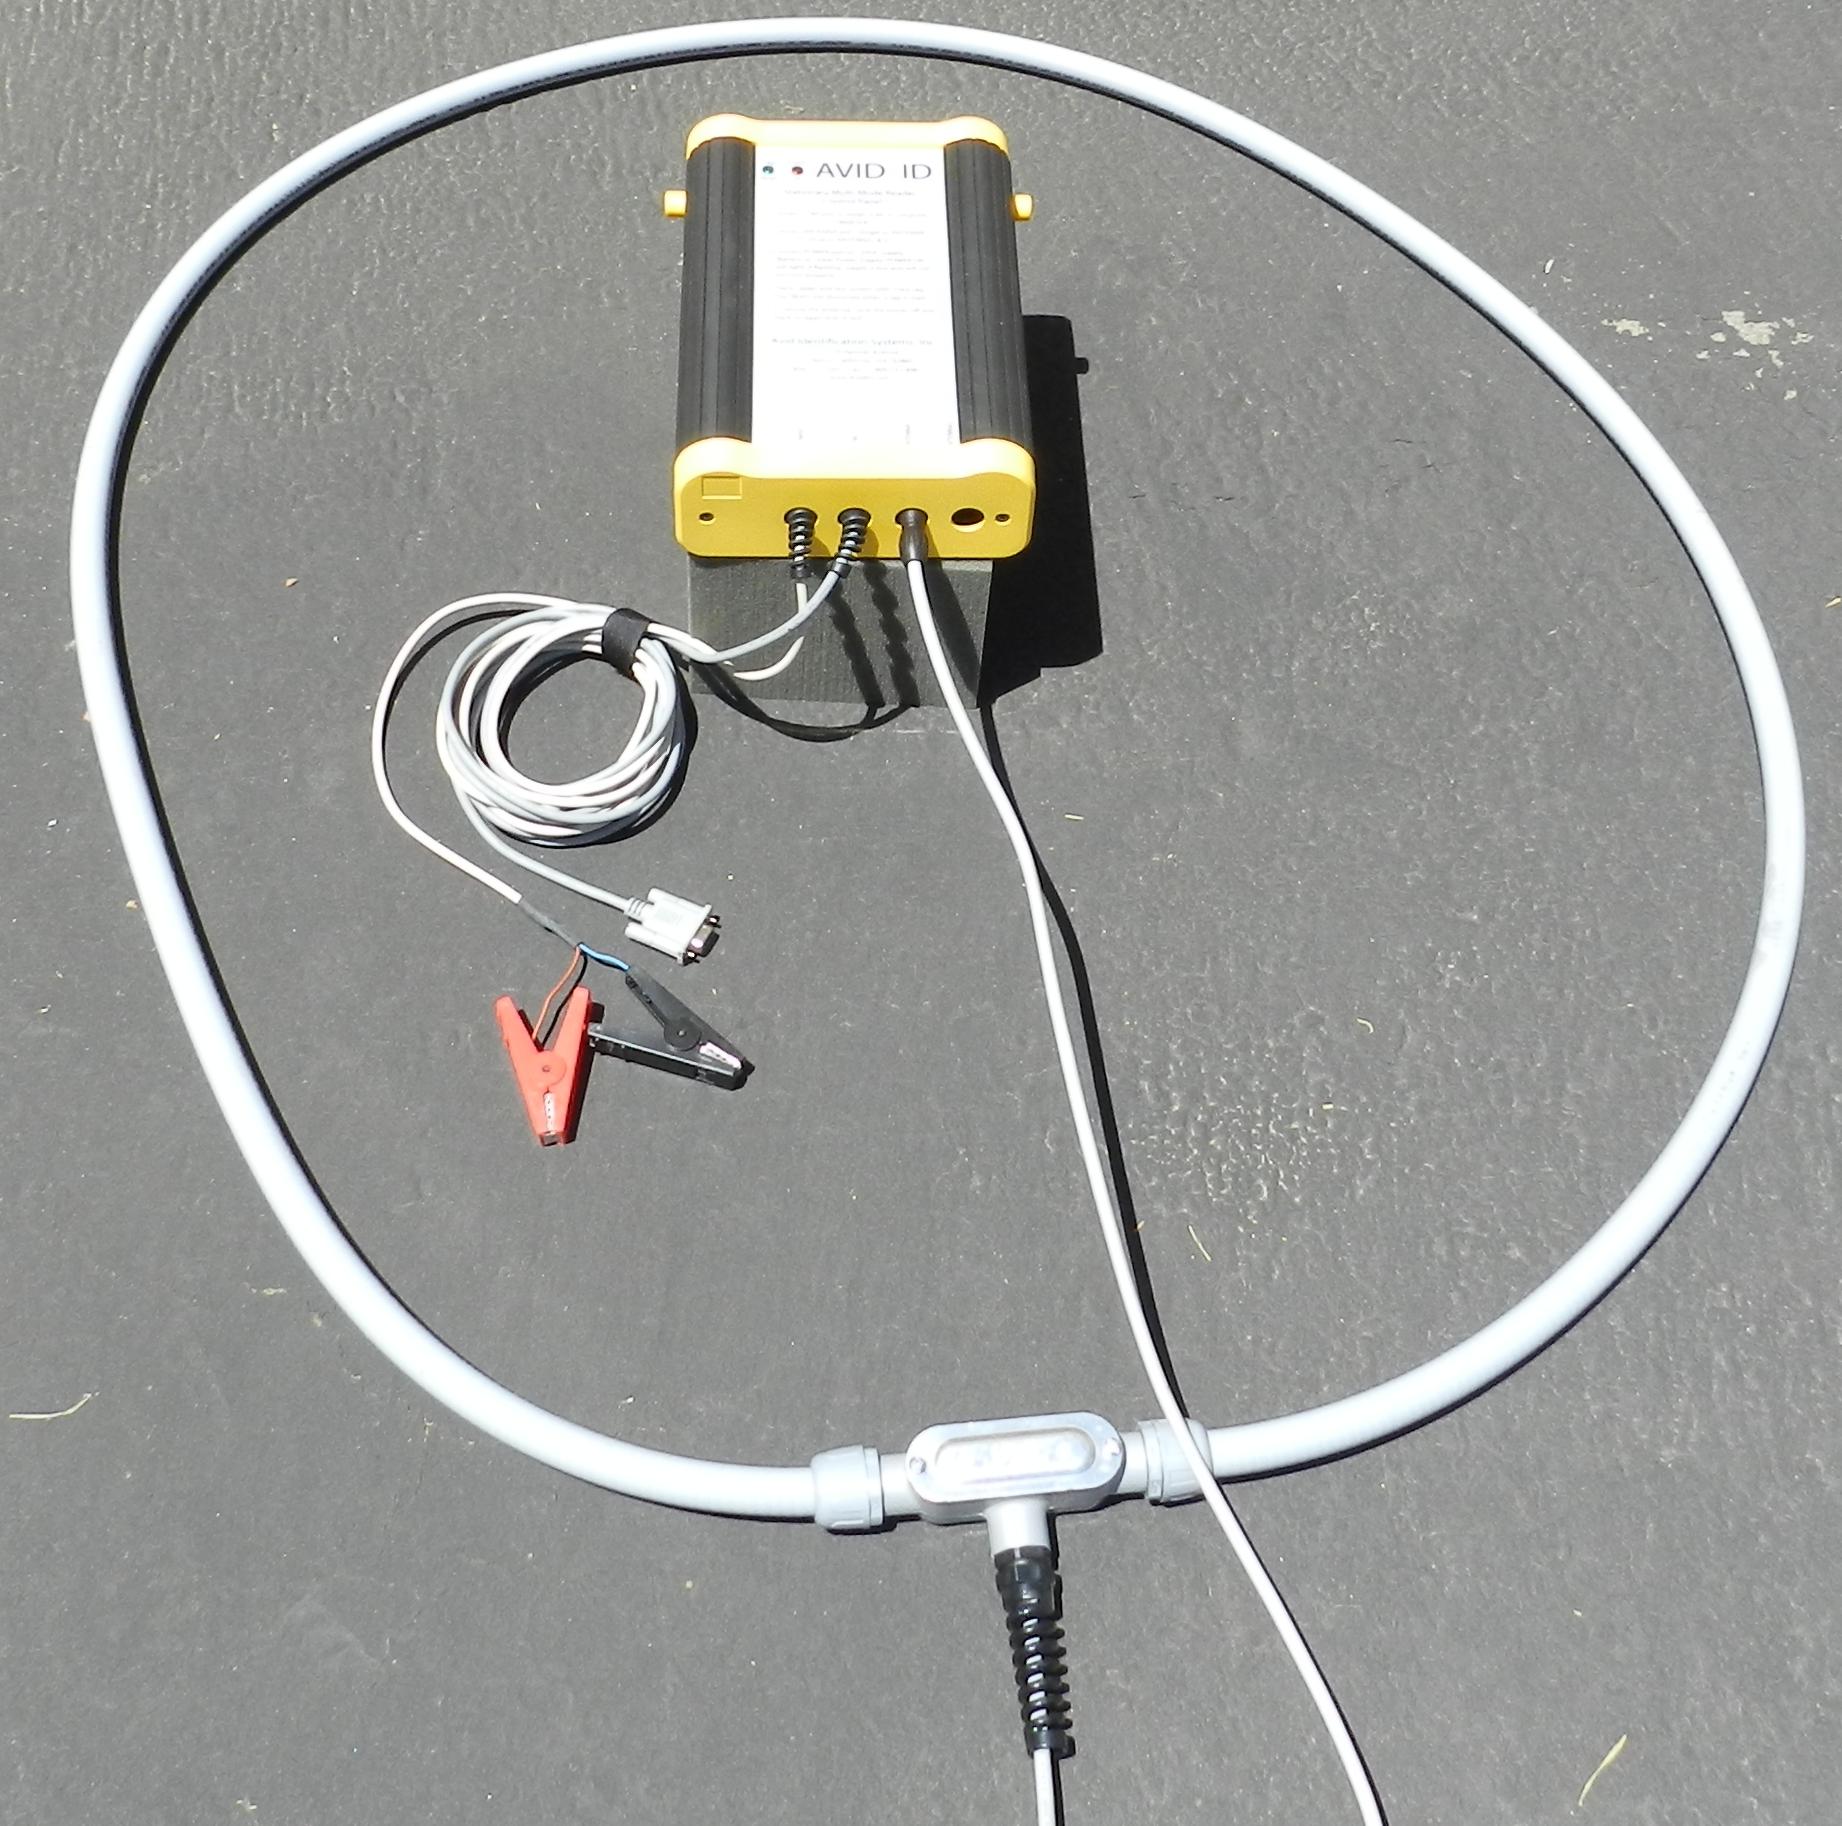 Auto-Tuning Reader (ISO FDX and HDX) | Avid Identification